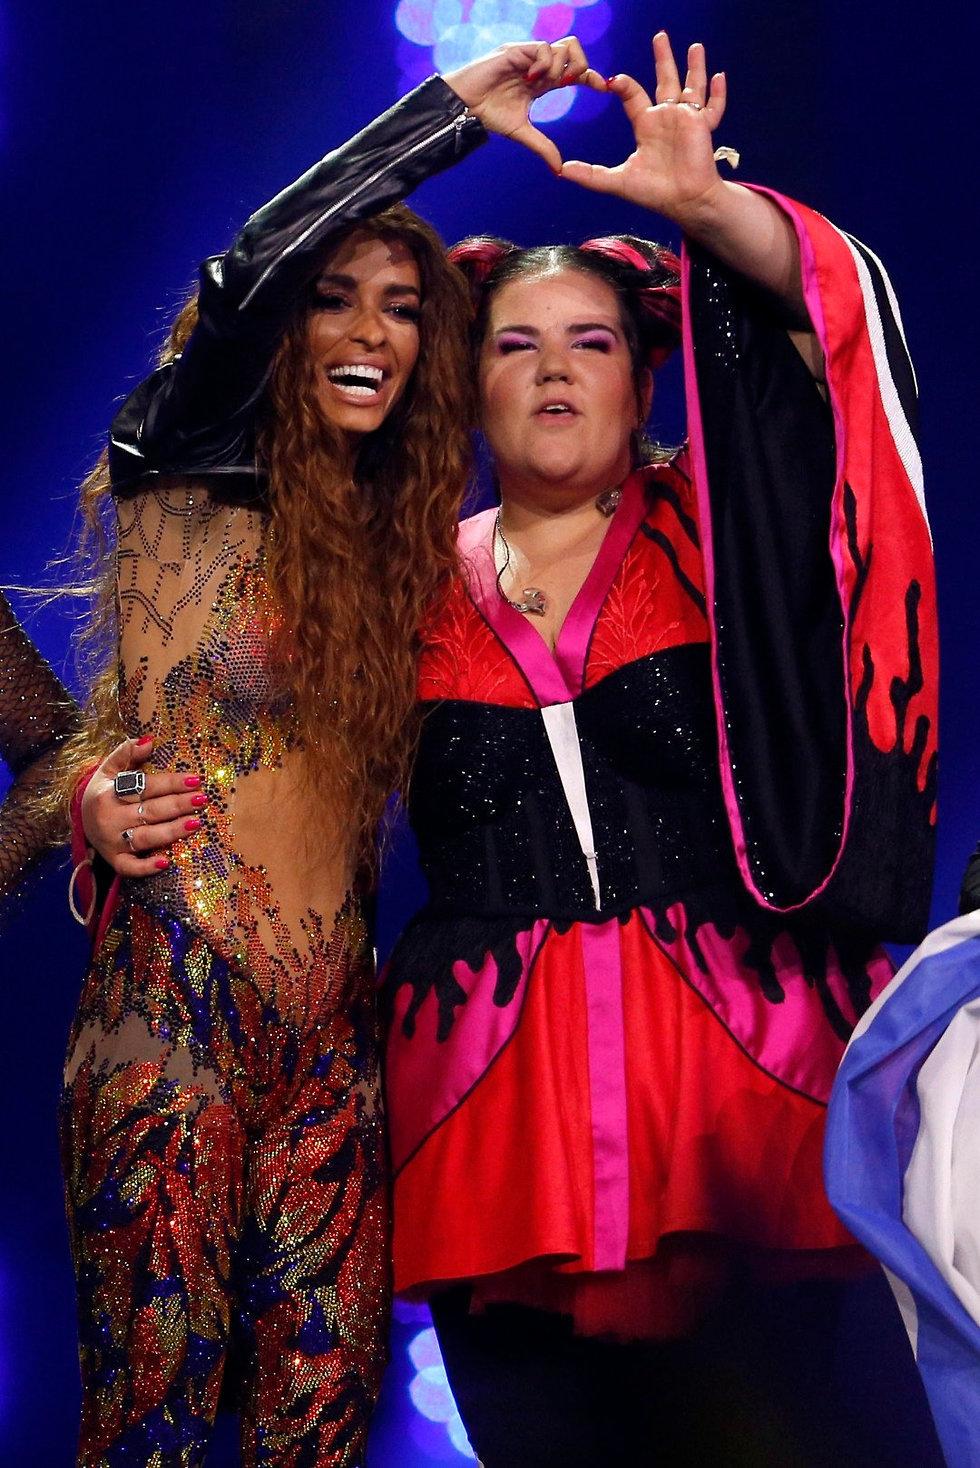 נטע ברזילי ואלני פוריירה (צילום: Reuters)